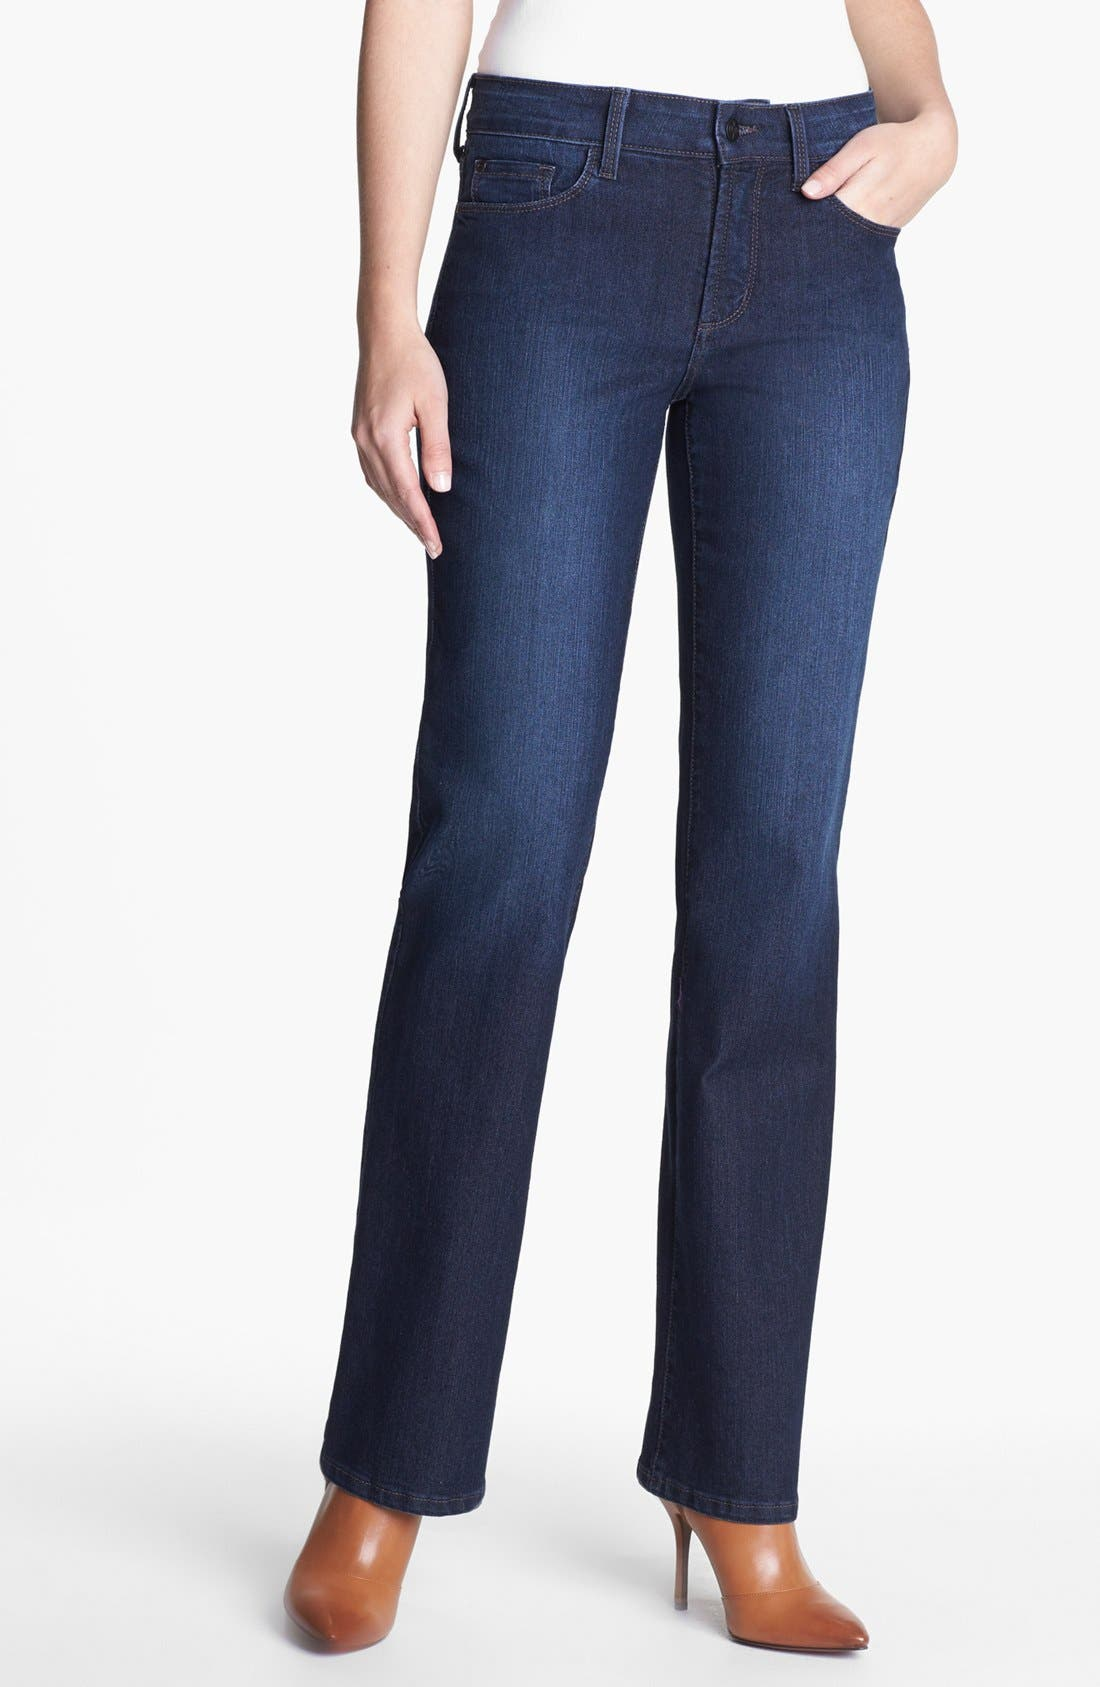 Alternate Image 1 Selected - NYDJ 'Barbara' Embellished Stretch Bootcut Jeans (Online Only)